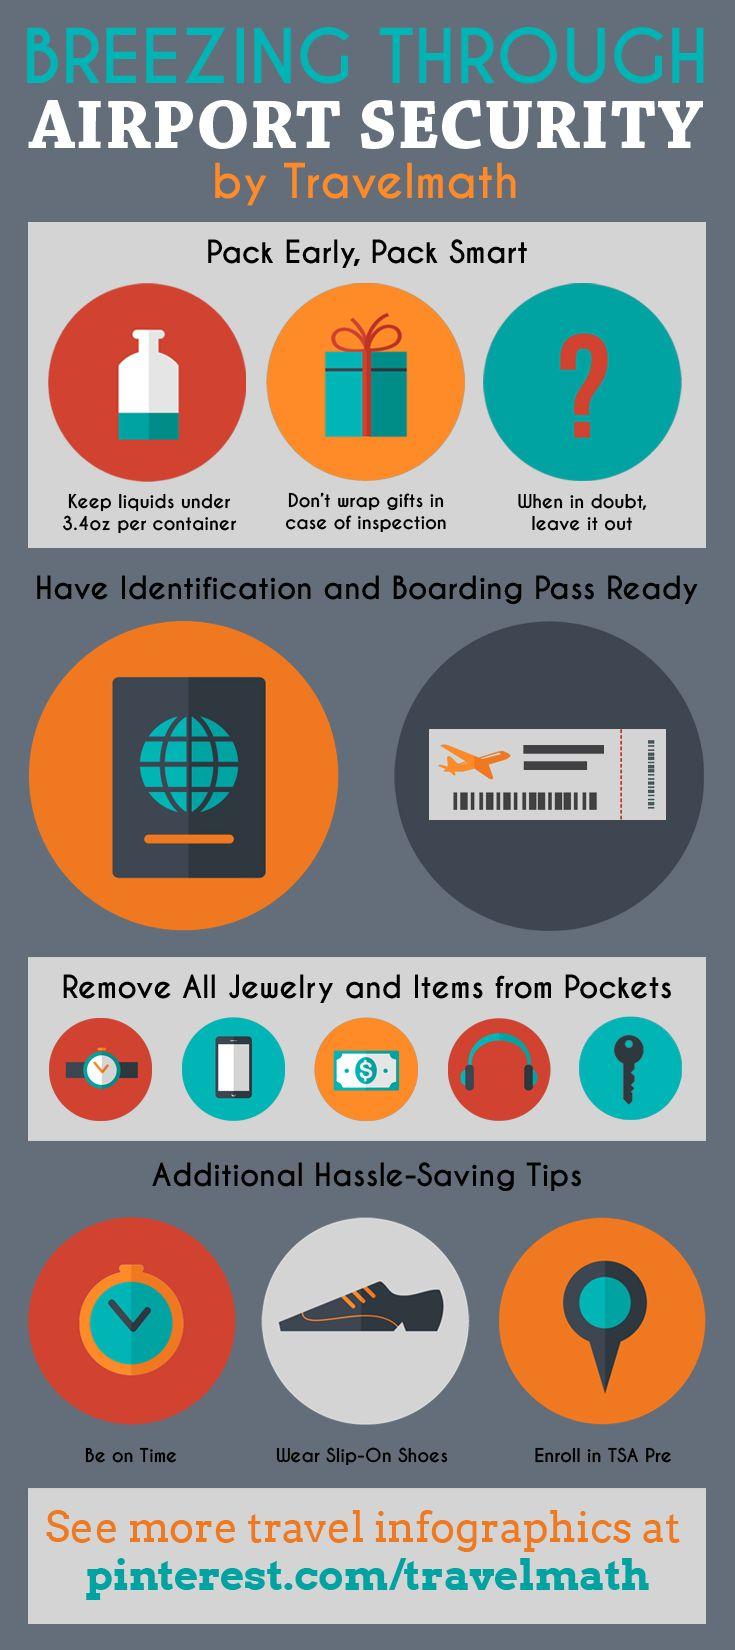 Interesting infographic ideas